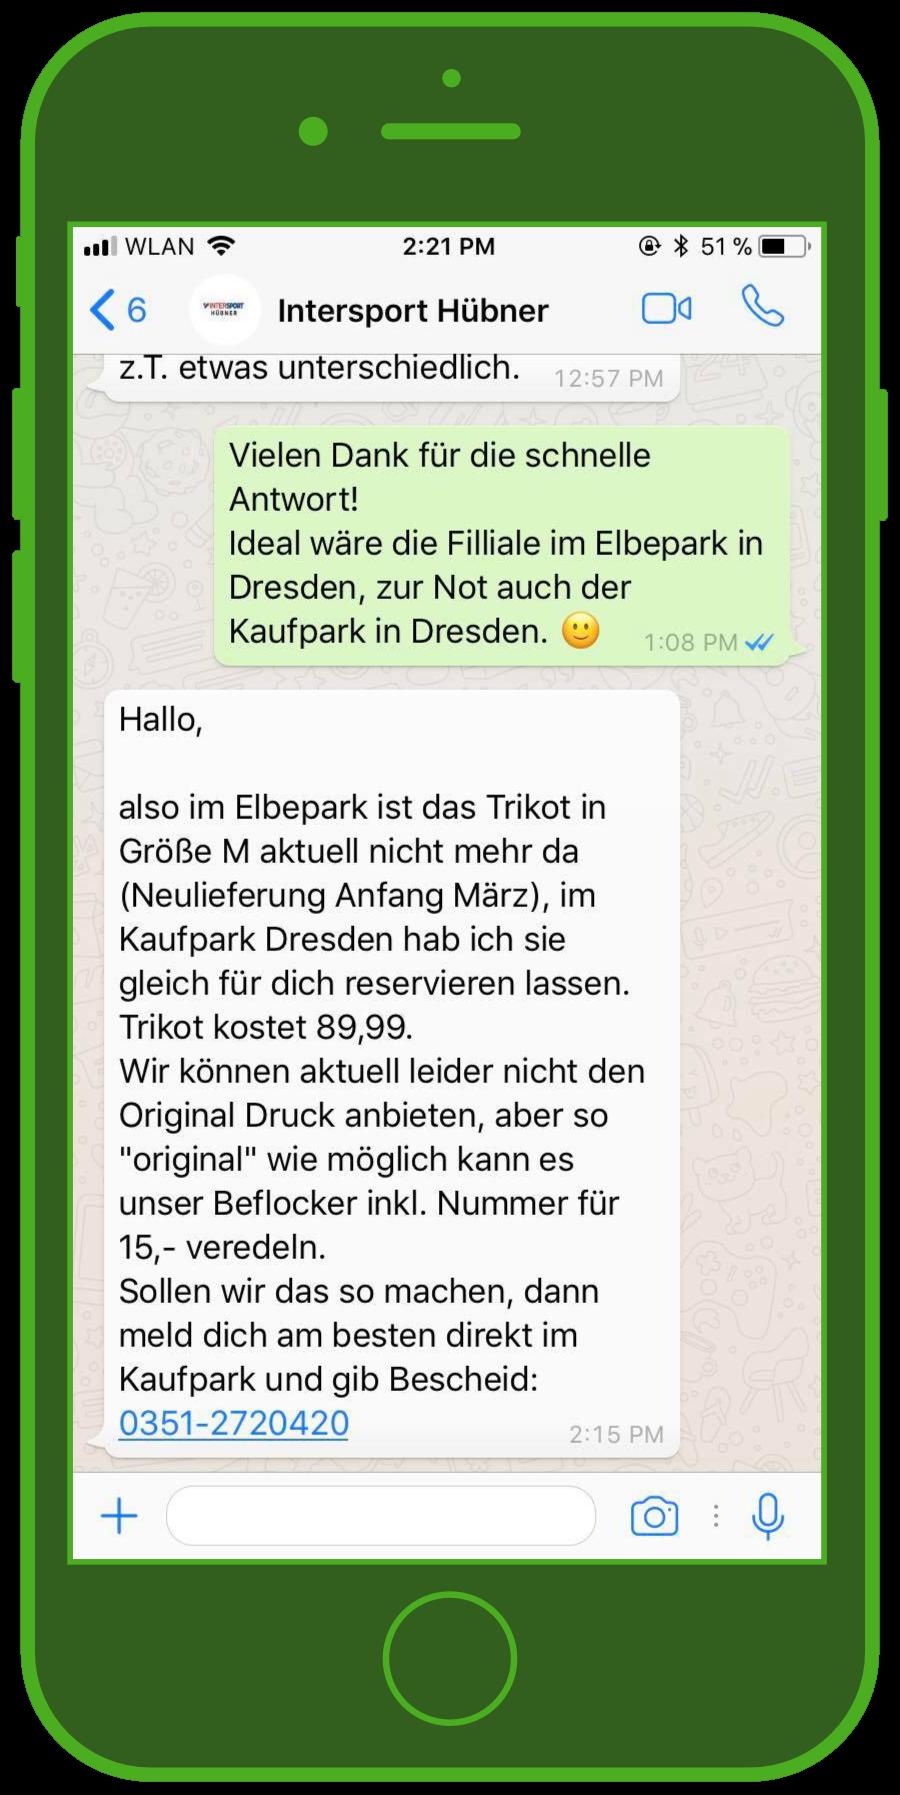 device-intersport-hübner-whatsapp-e-commerce